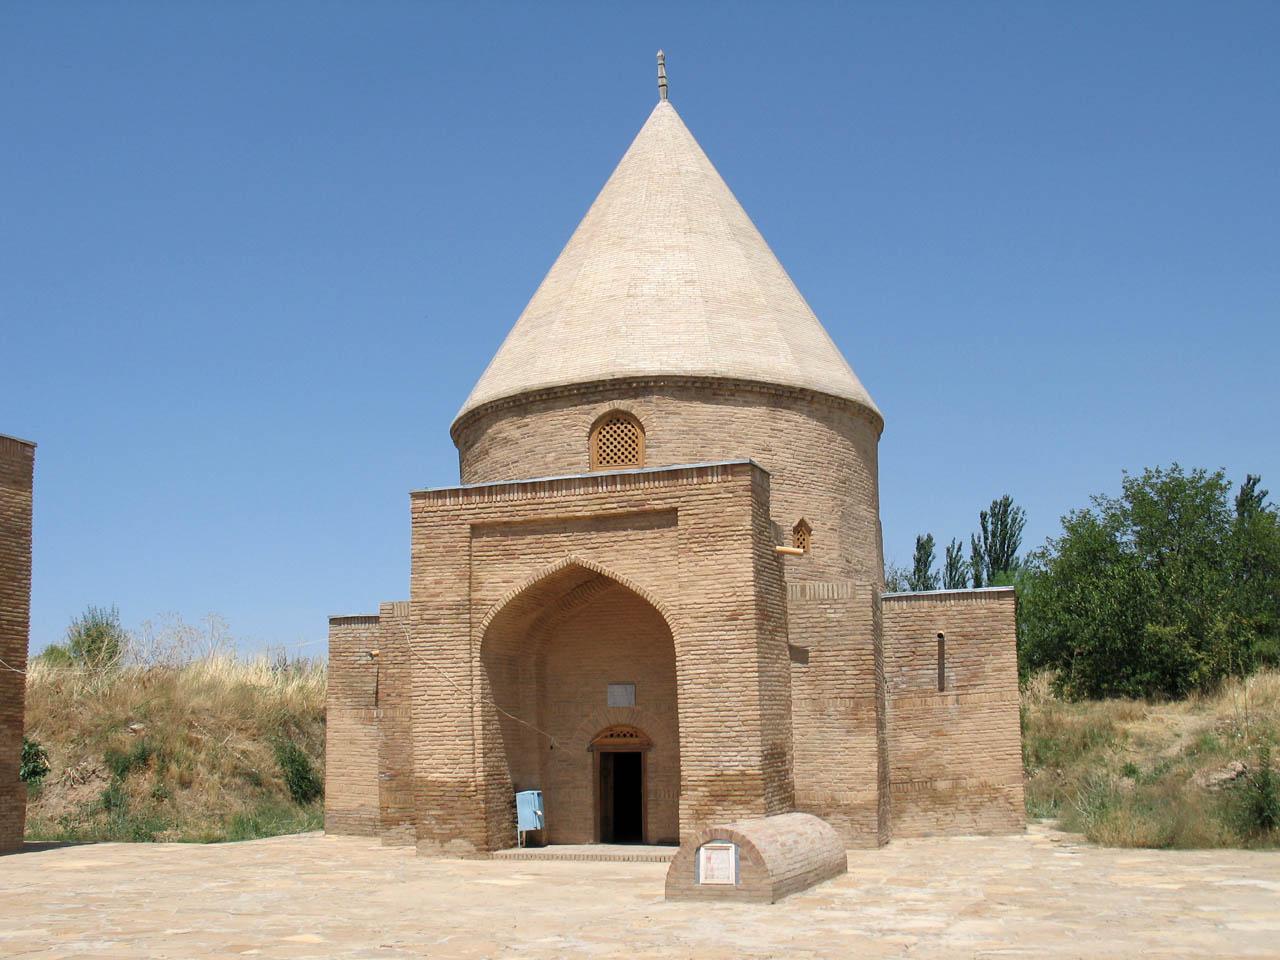 Мавзолей Исмаил Ата – памятник архитектуры XV века